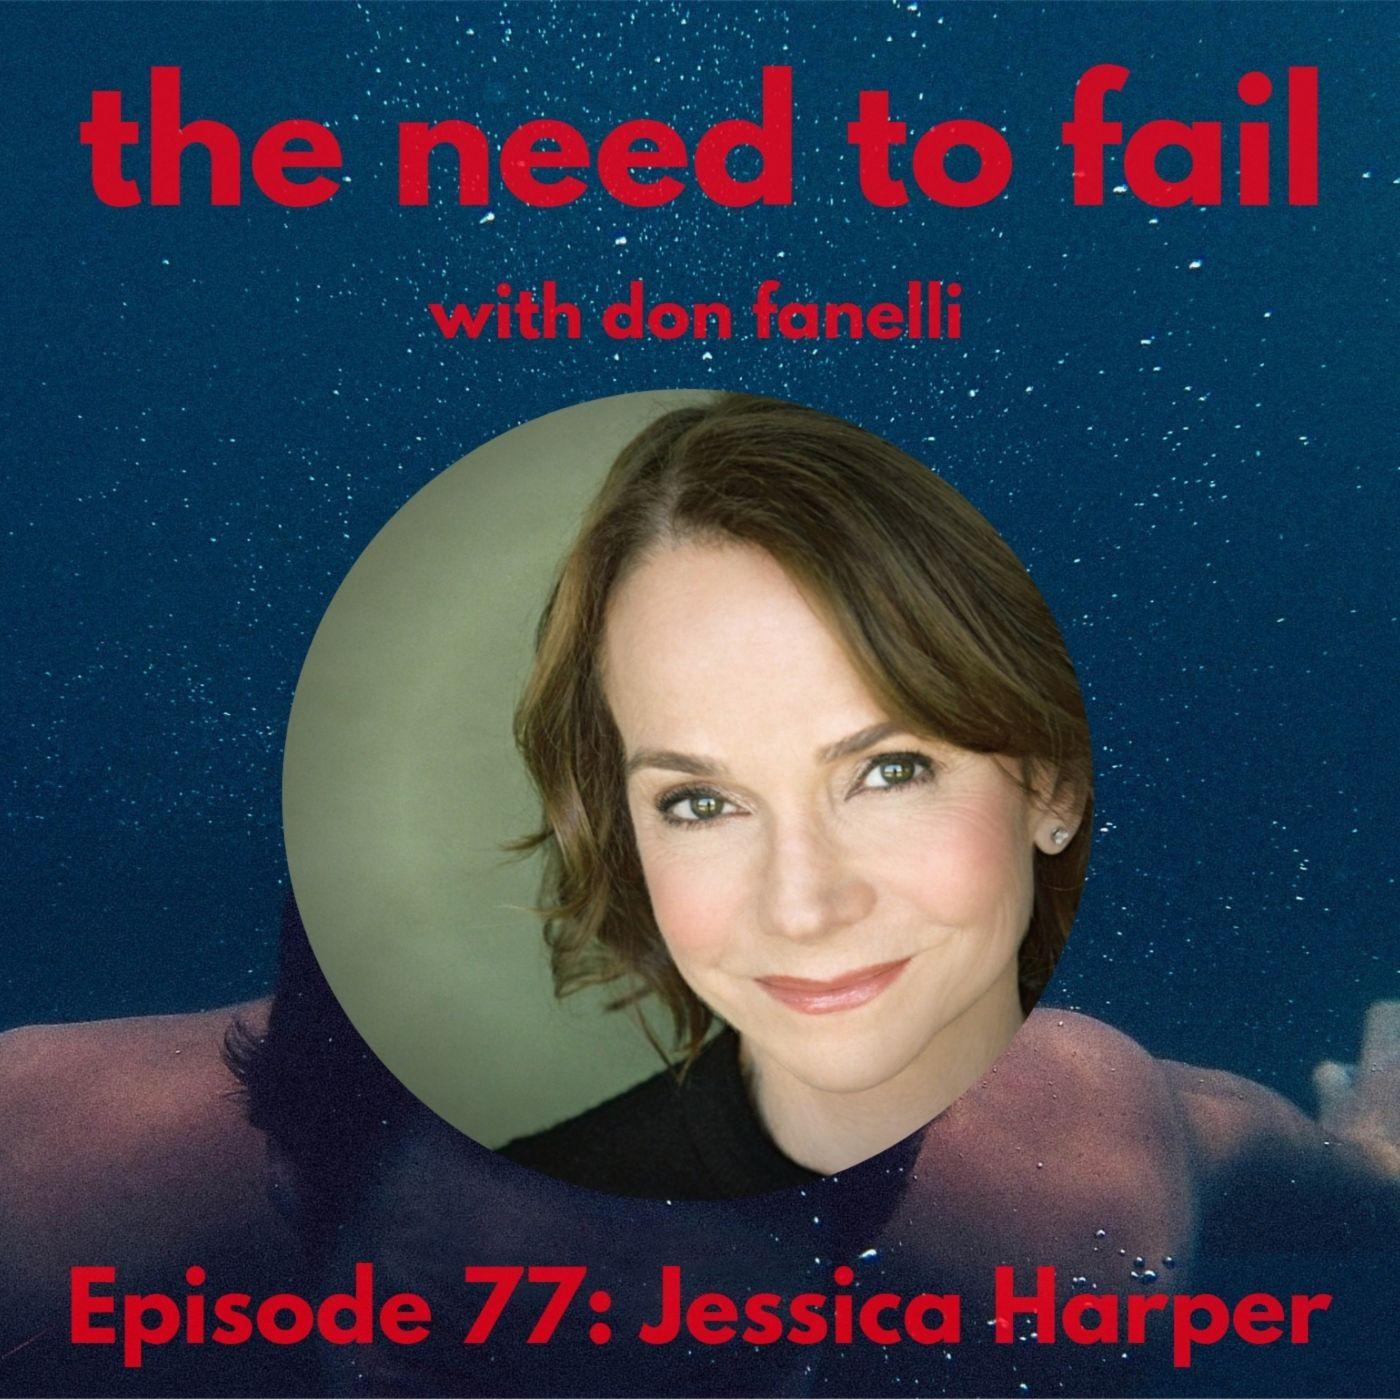 Episode 77: Jessica Harper